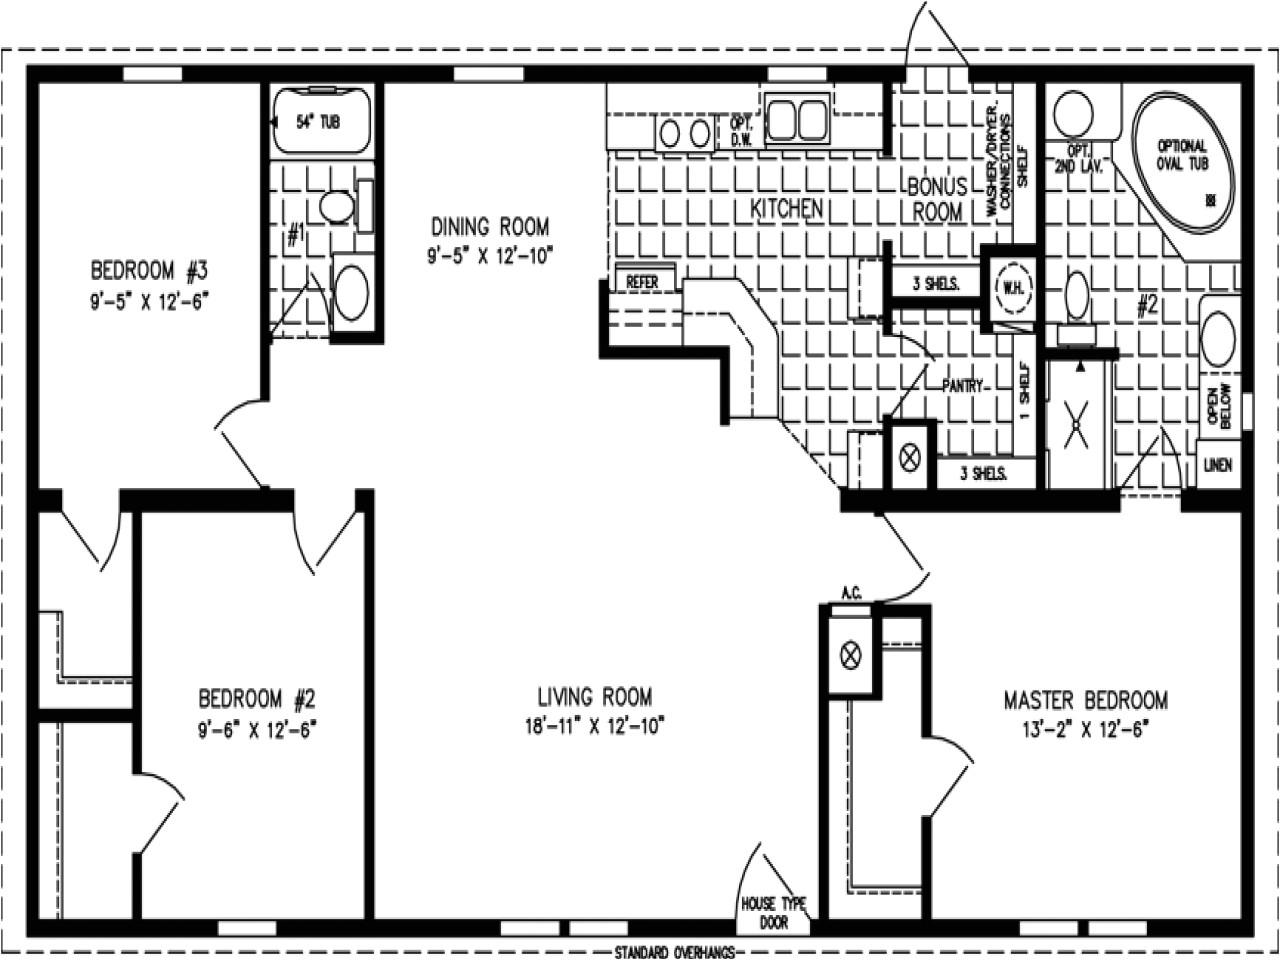 9e18c8de4a21bc75 1200 sq ft home floor plans 4000 sq ft homes